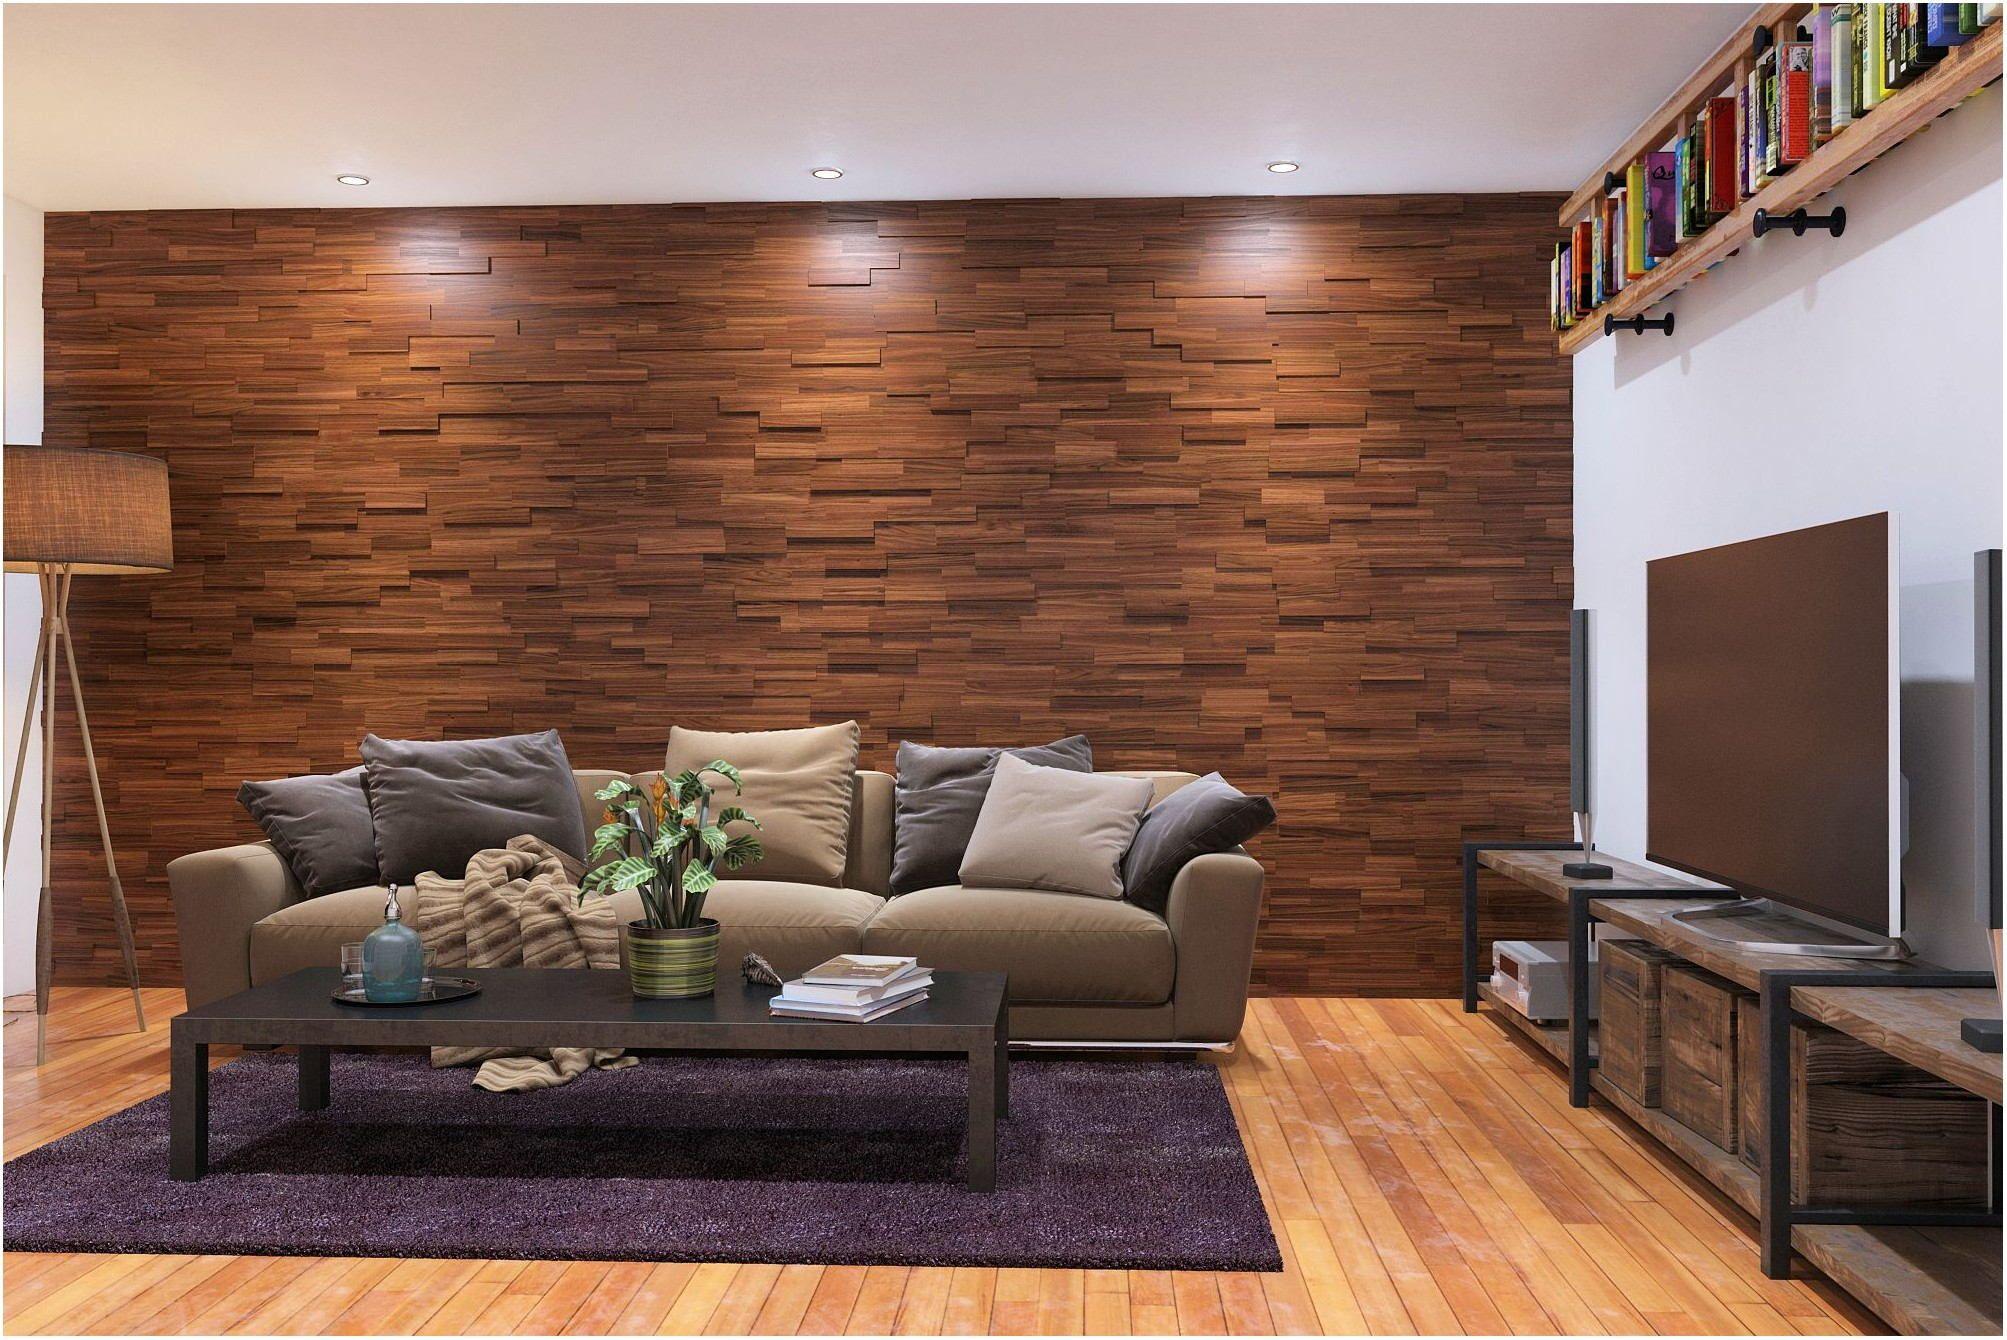 Interior Design Living Room Wall Paneling Wooden Wall Design Wood Panel Walls Wooden Wall Panels